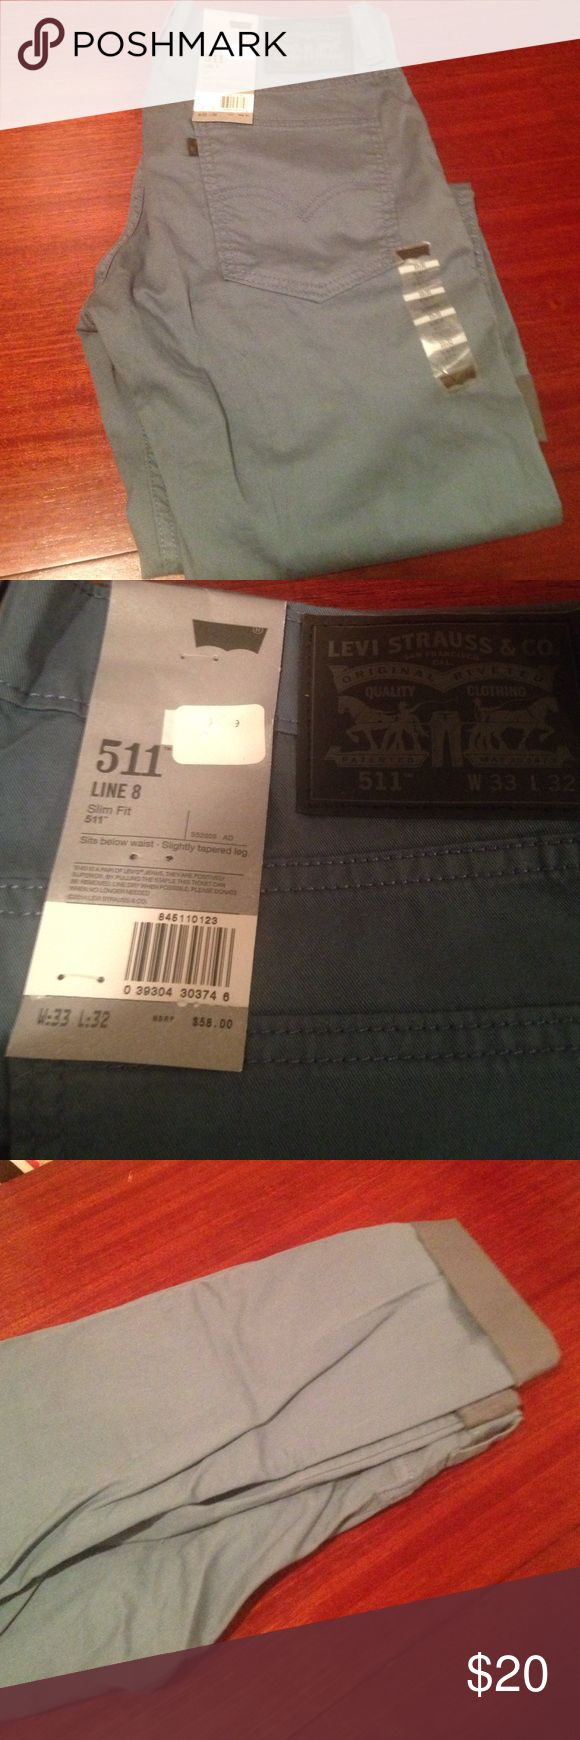 Men's Levi's 511 pants Sz 33/32 brand new! Levi's Pants Chinos & Khakis